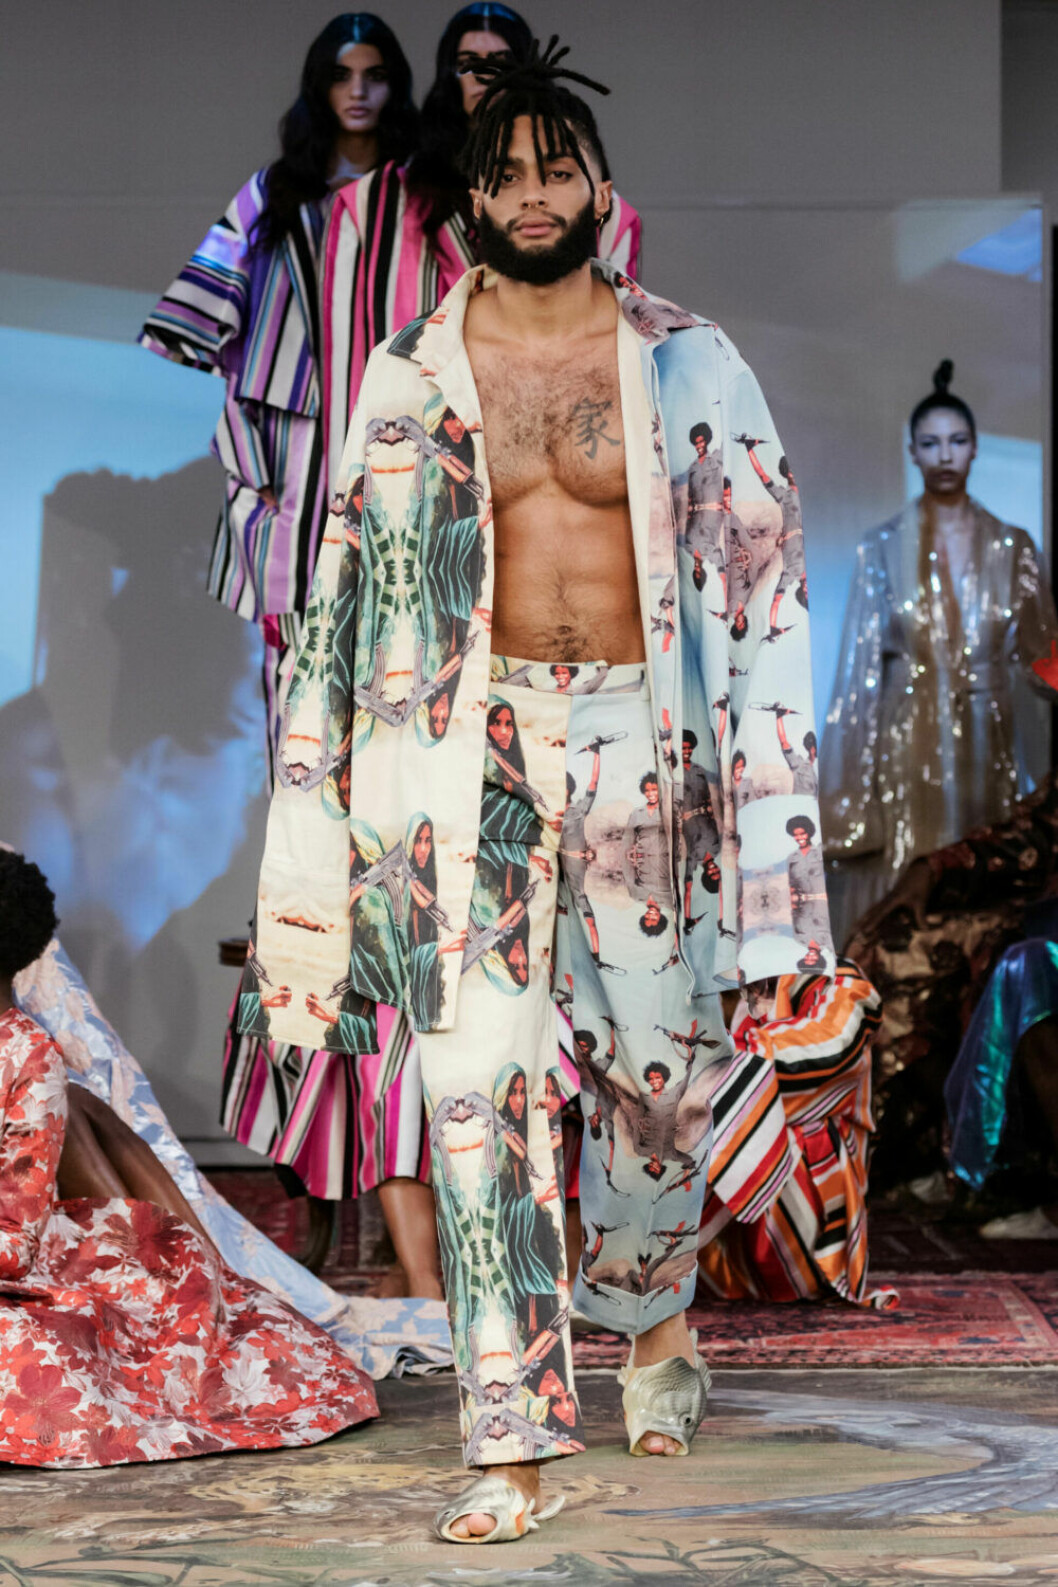 Pyjamasinfluenser på Selam Fessahayes AW19–visning på Fashion Week Stockholm